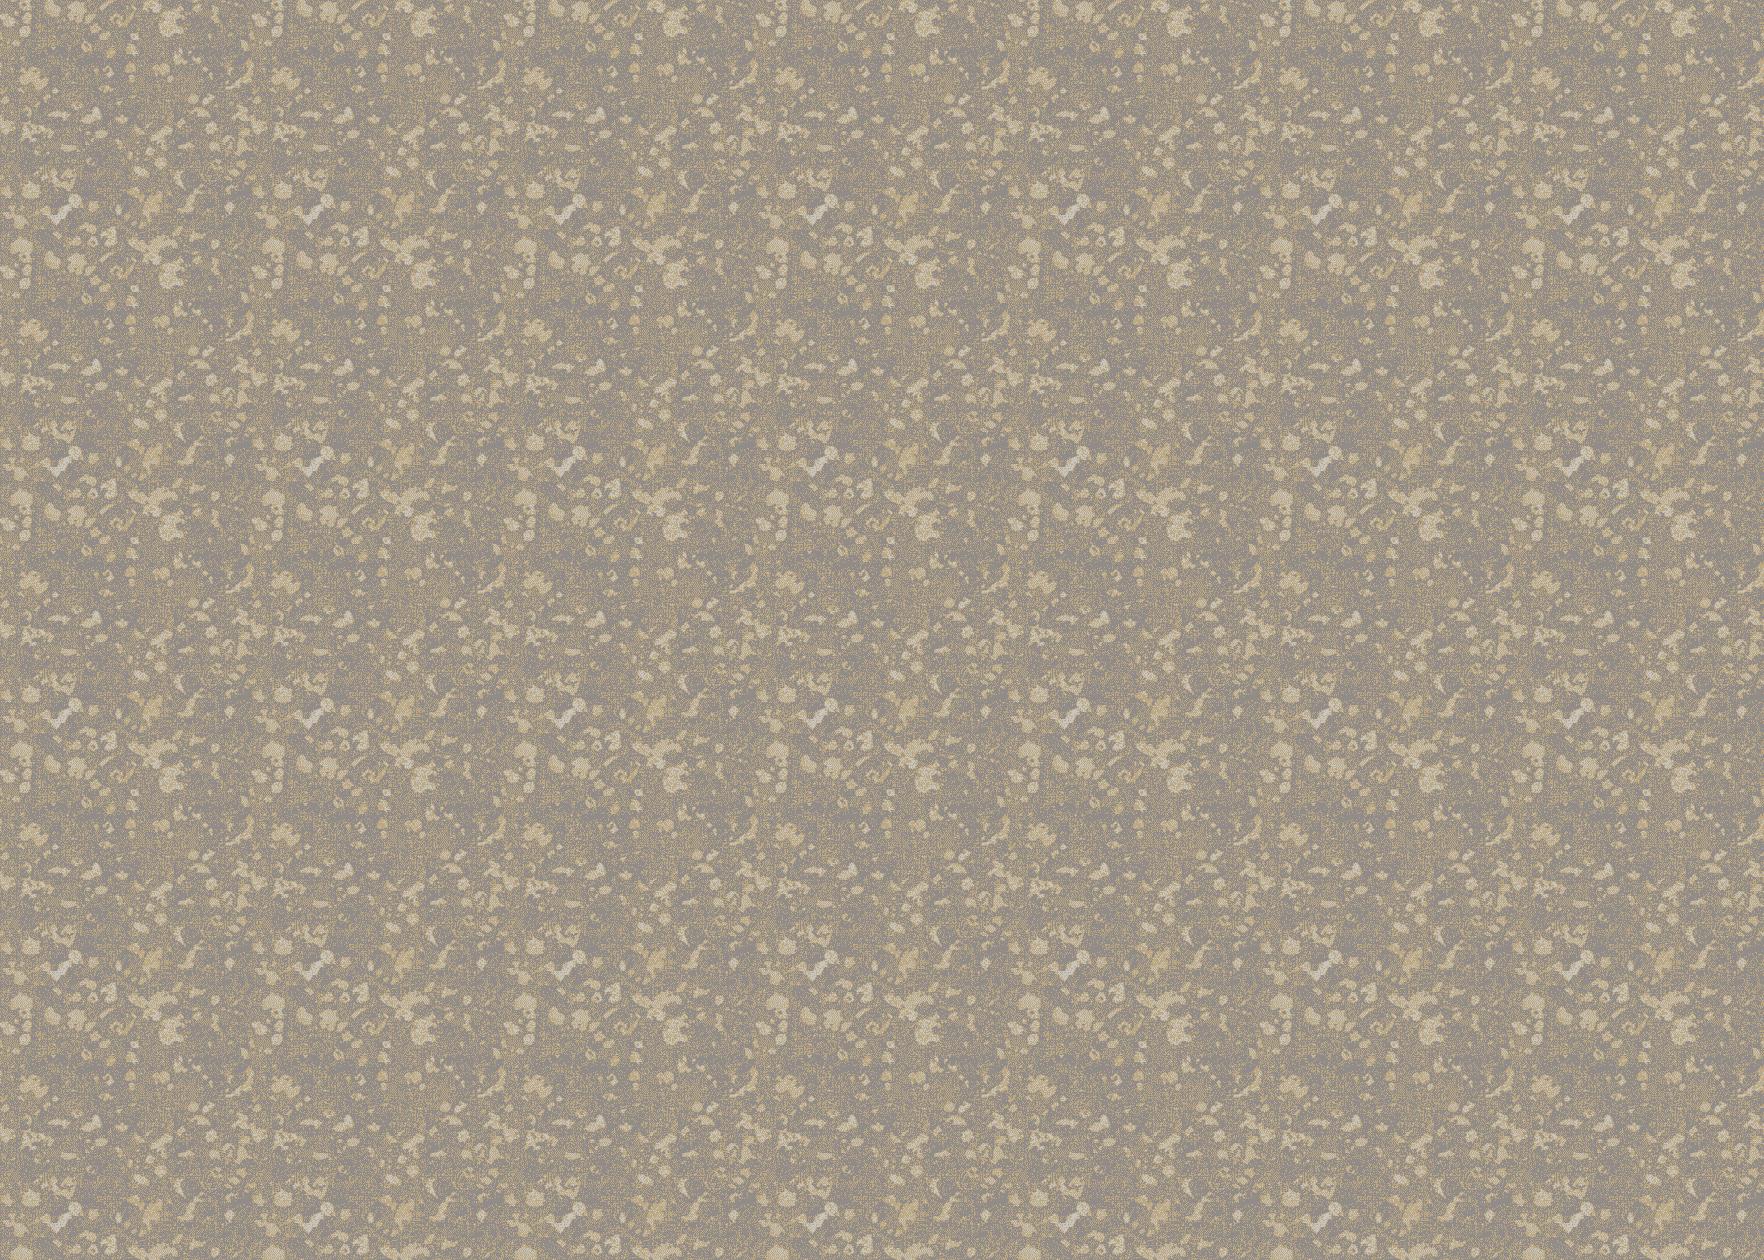 Axminster- BX04843r2